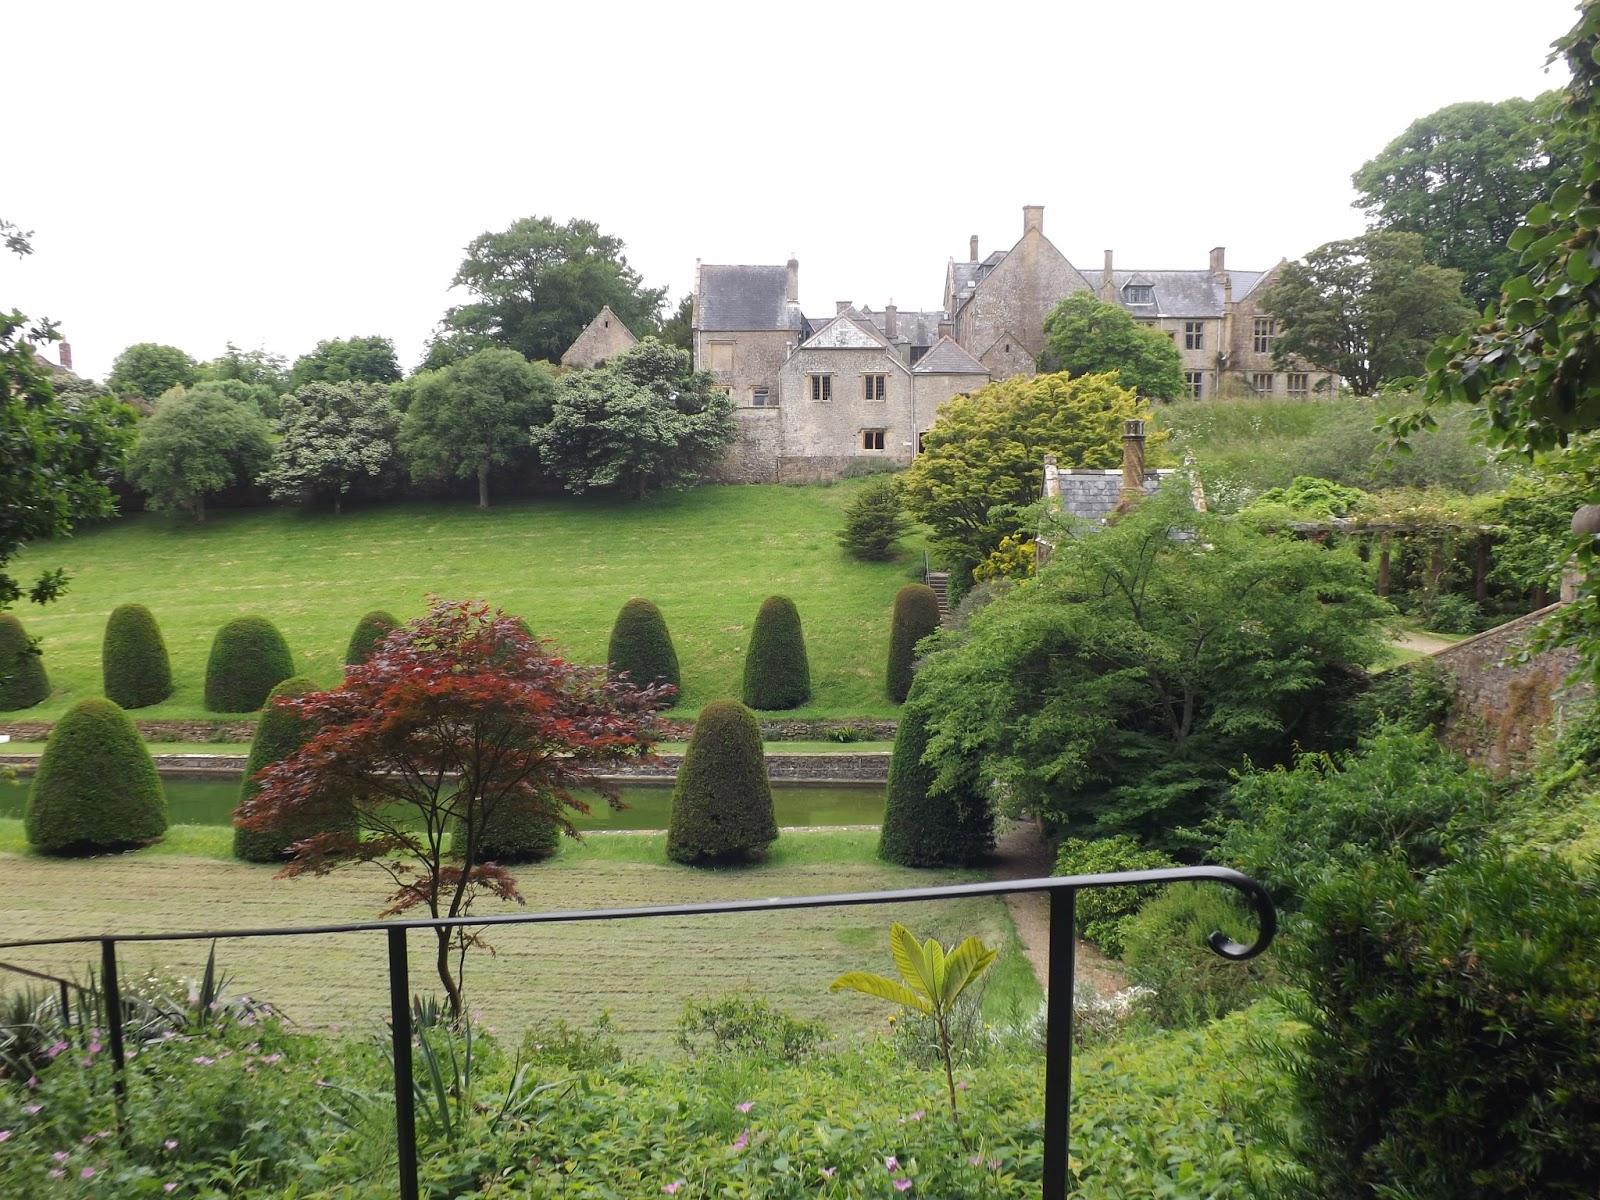 Ramblings from an English Garden: Mapperton House & Gardens, Dorset